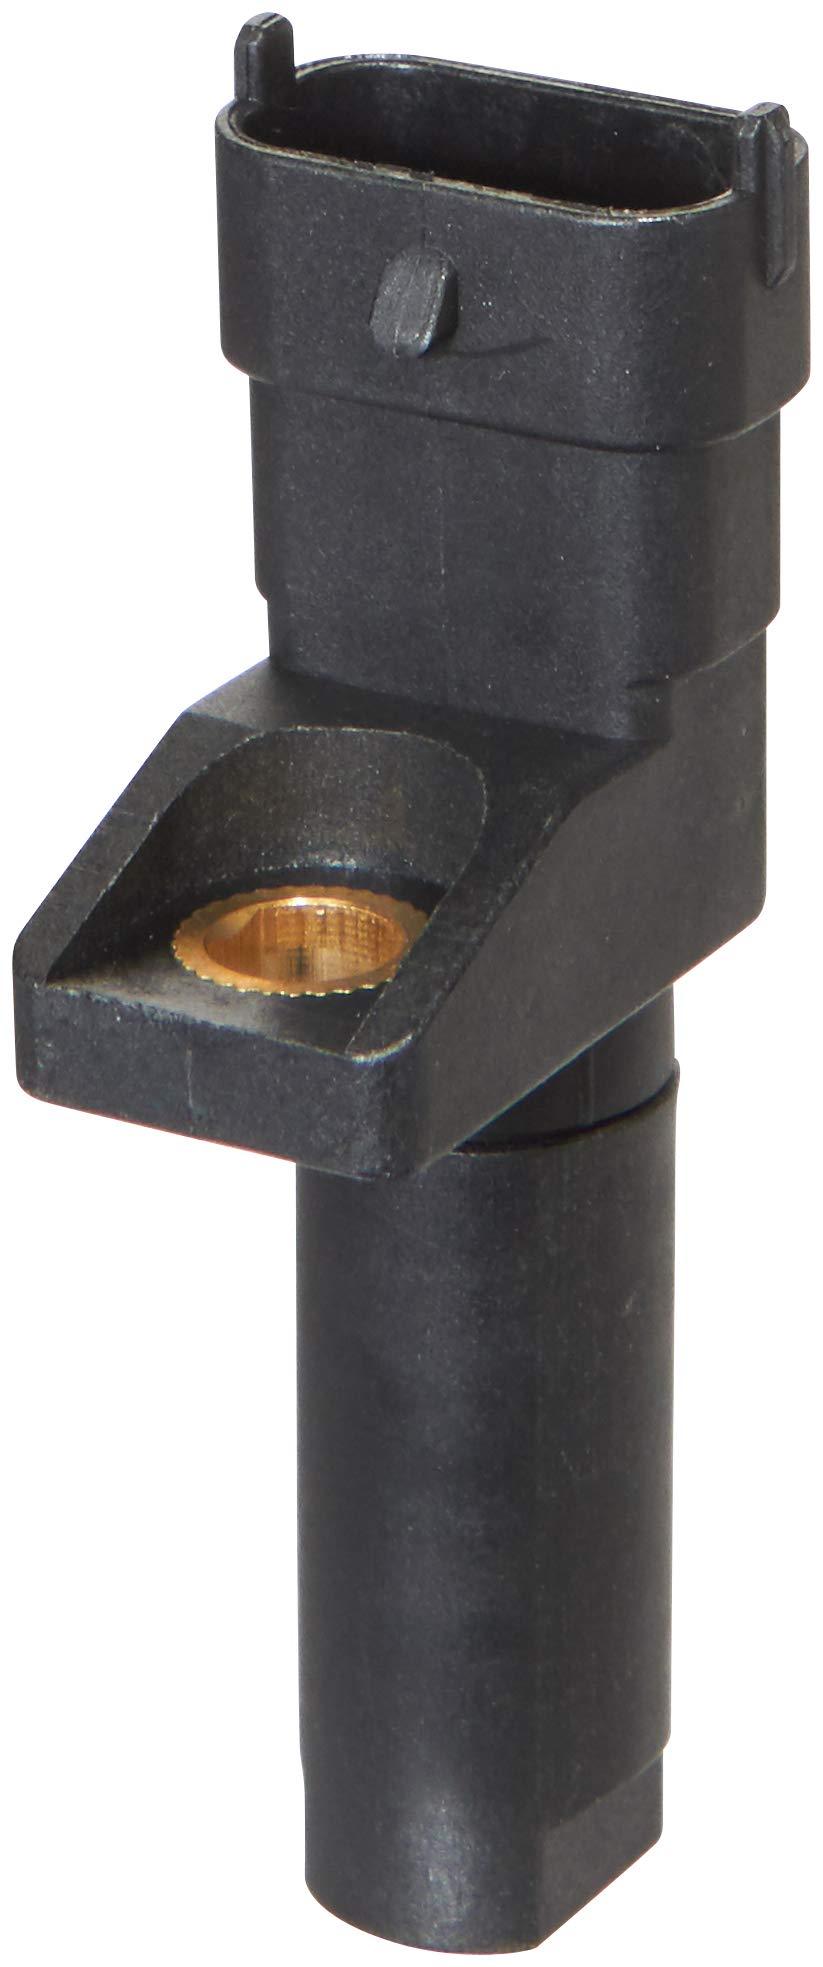 Spectra Premium S10220 Crankshaft Position Sensor by Spectra Premium